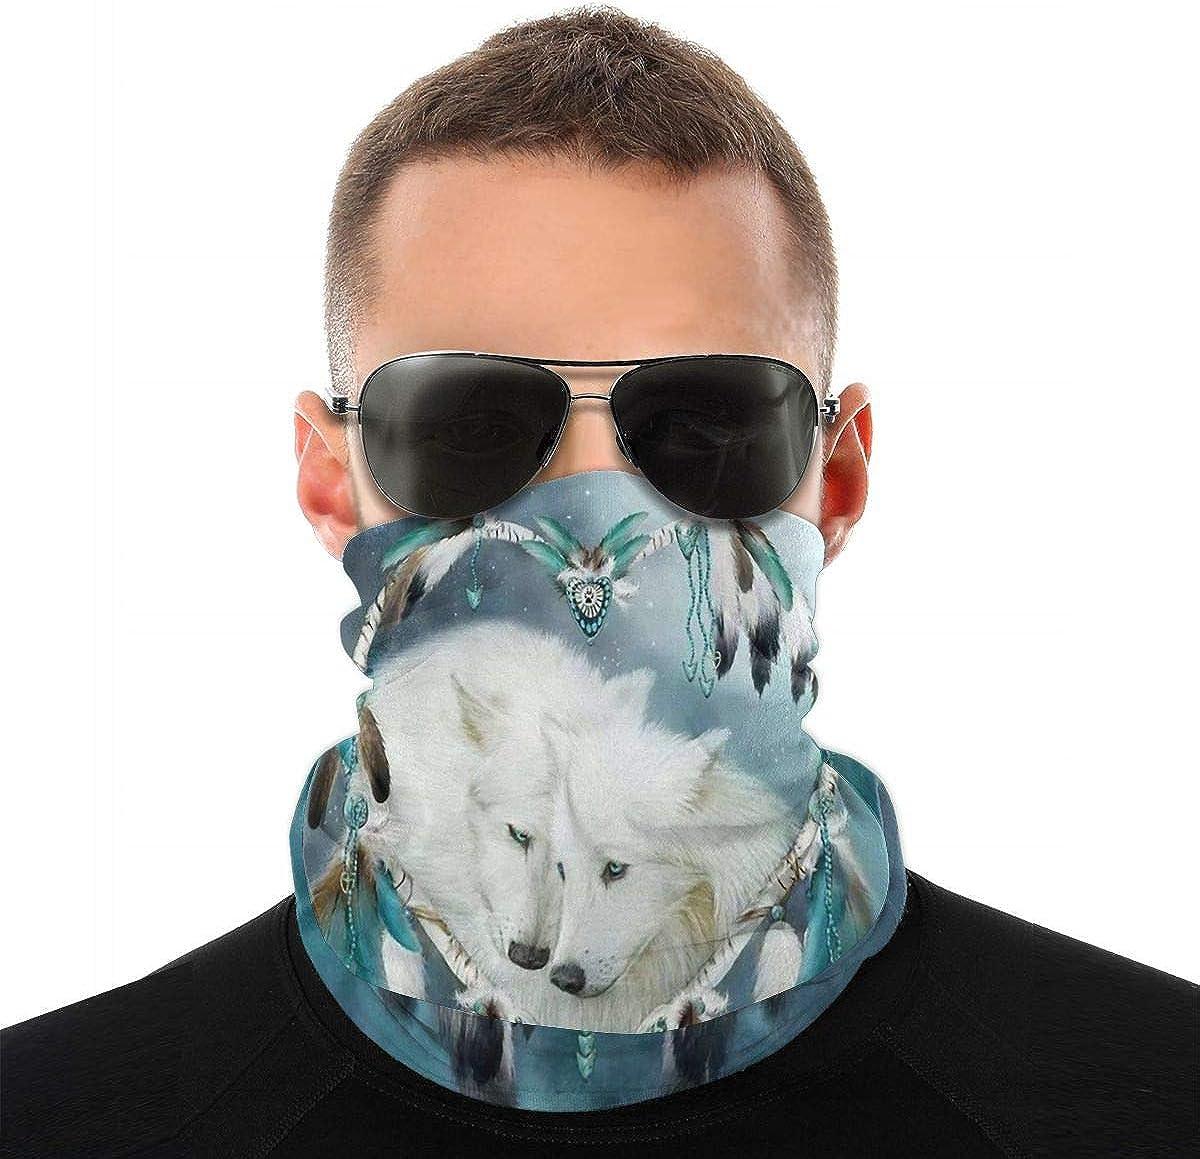 KiuLoam Tribal Ethnic Dreamcatcher Wolf Seamless Face Mask Bandanas Neck Gaiter for Men and Women, Multifunction Headband Scarf for Dust, Outdoors, Sports